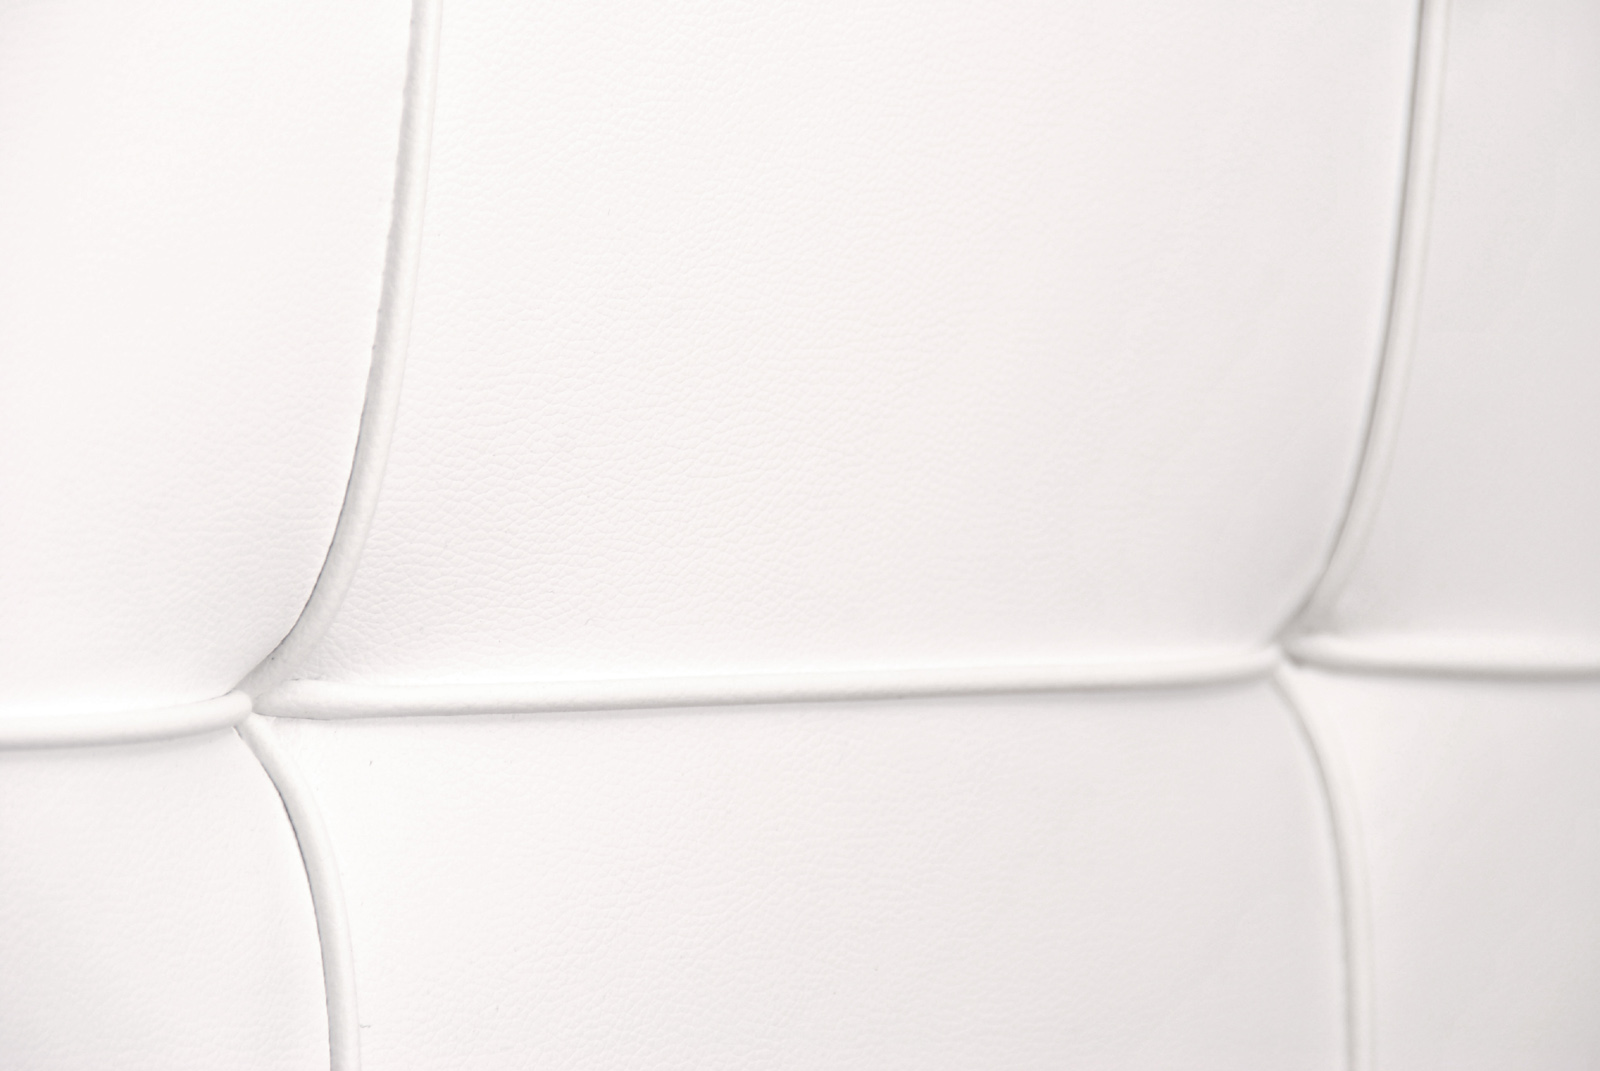 sam polsterbett 120x200 cm wei bettgestell g nstig zarah. Black Bedroom Furniture Sets. Home Design Ideas